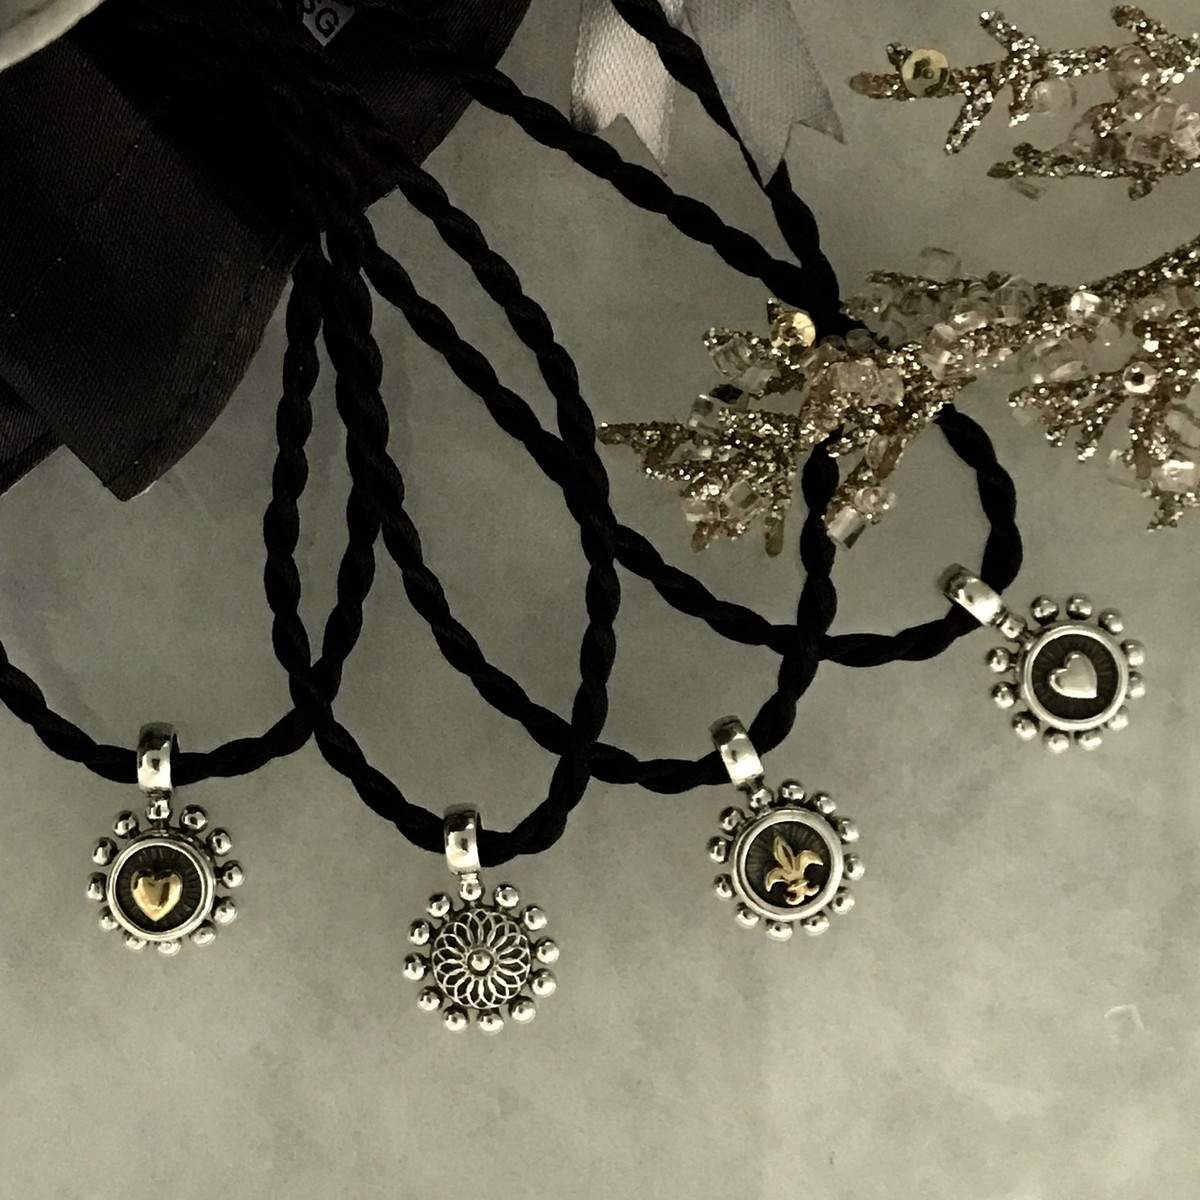 Beaded heart pendant silver silk cord handmade bowman originals handmade pendants silver gold silk cord by bowman originals sarasota aloadofball Choice Image